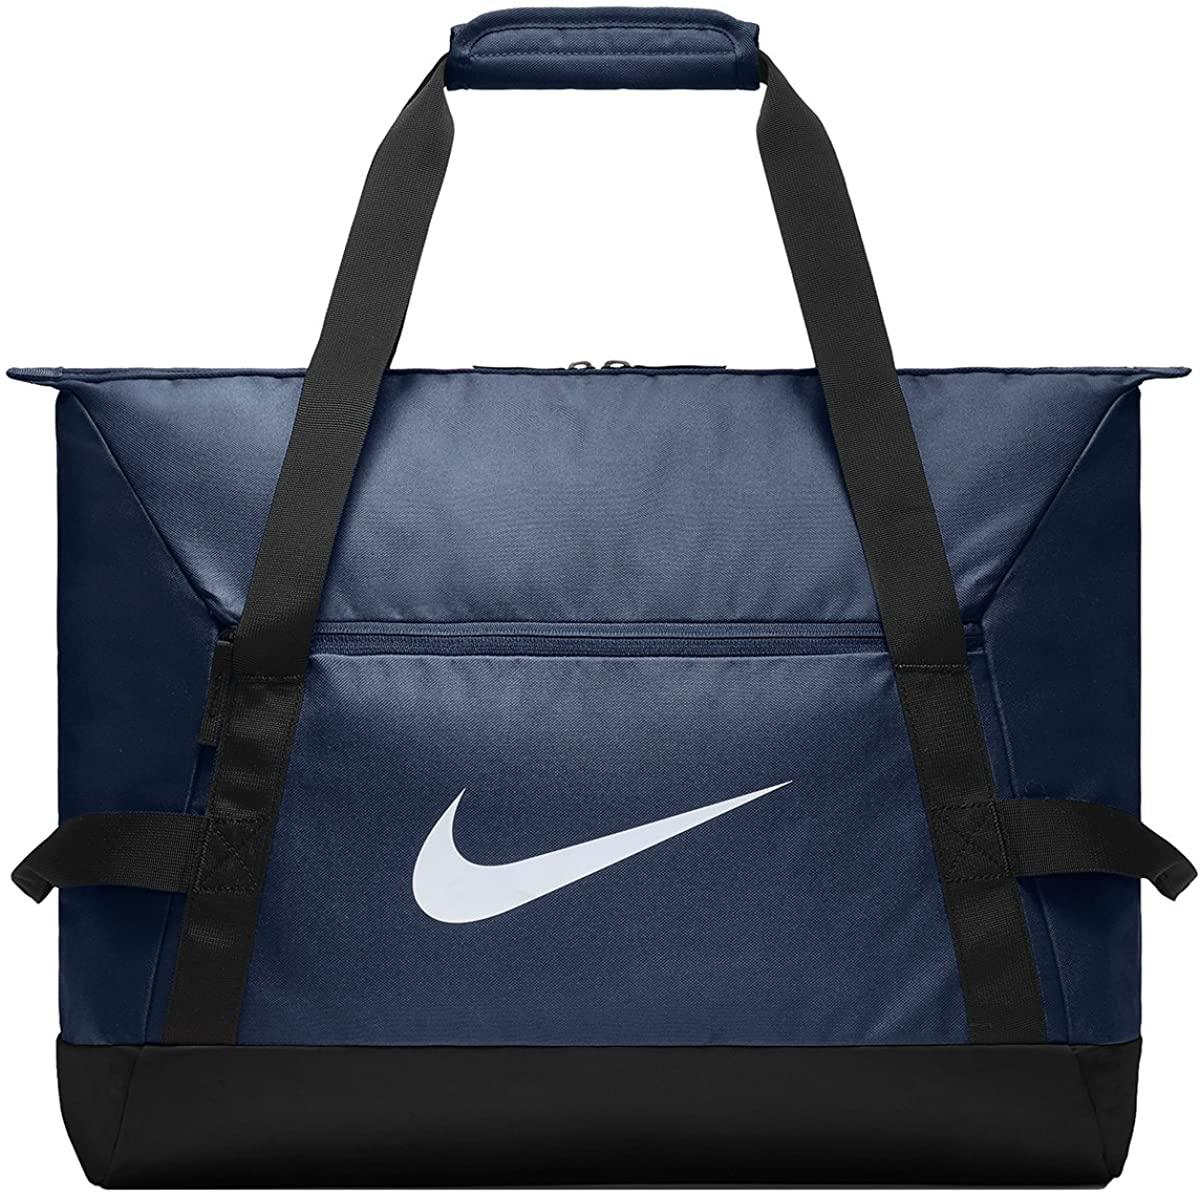 Bolsa de deporte unisex Nike Academy Team Duffel M